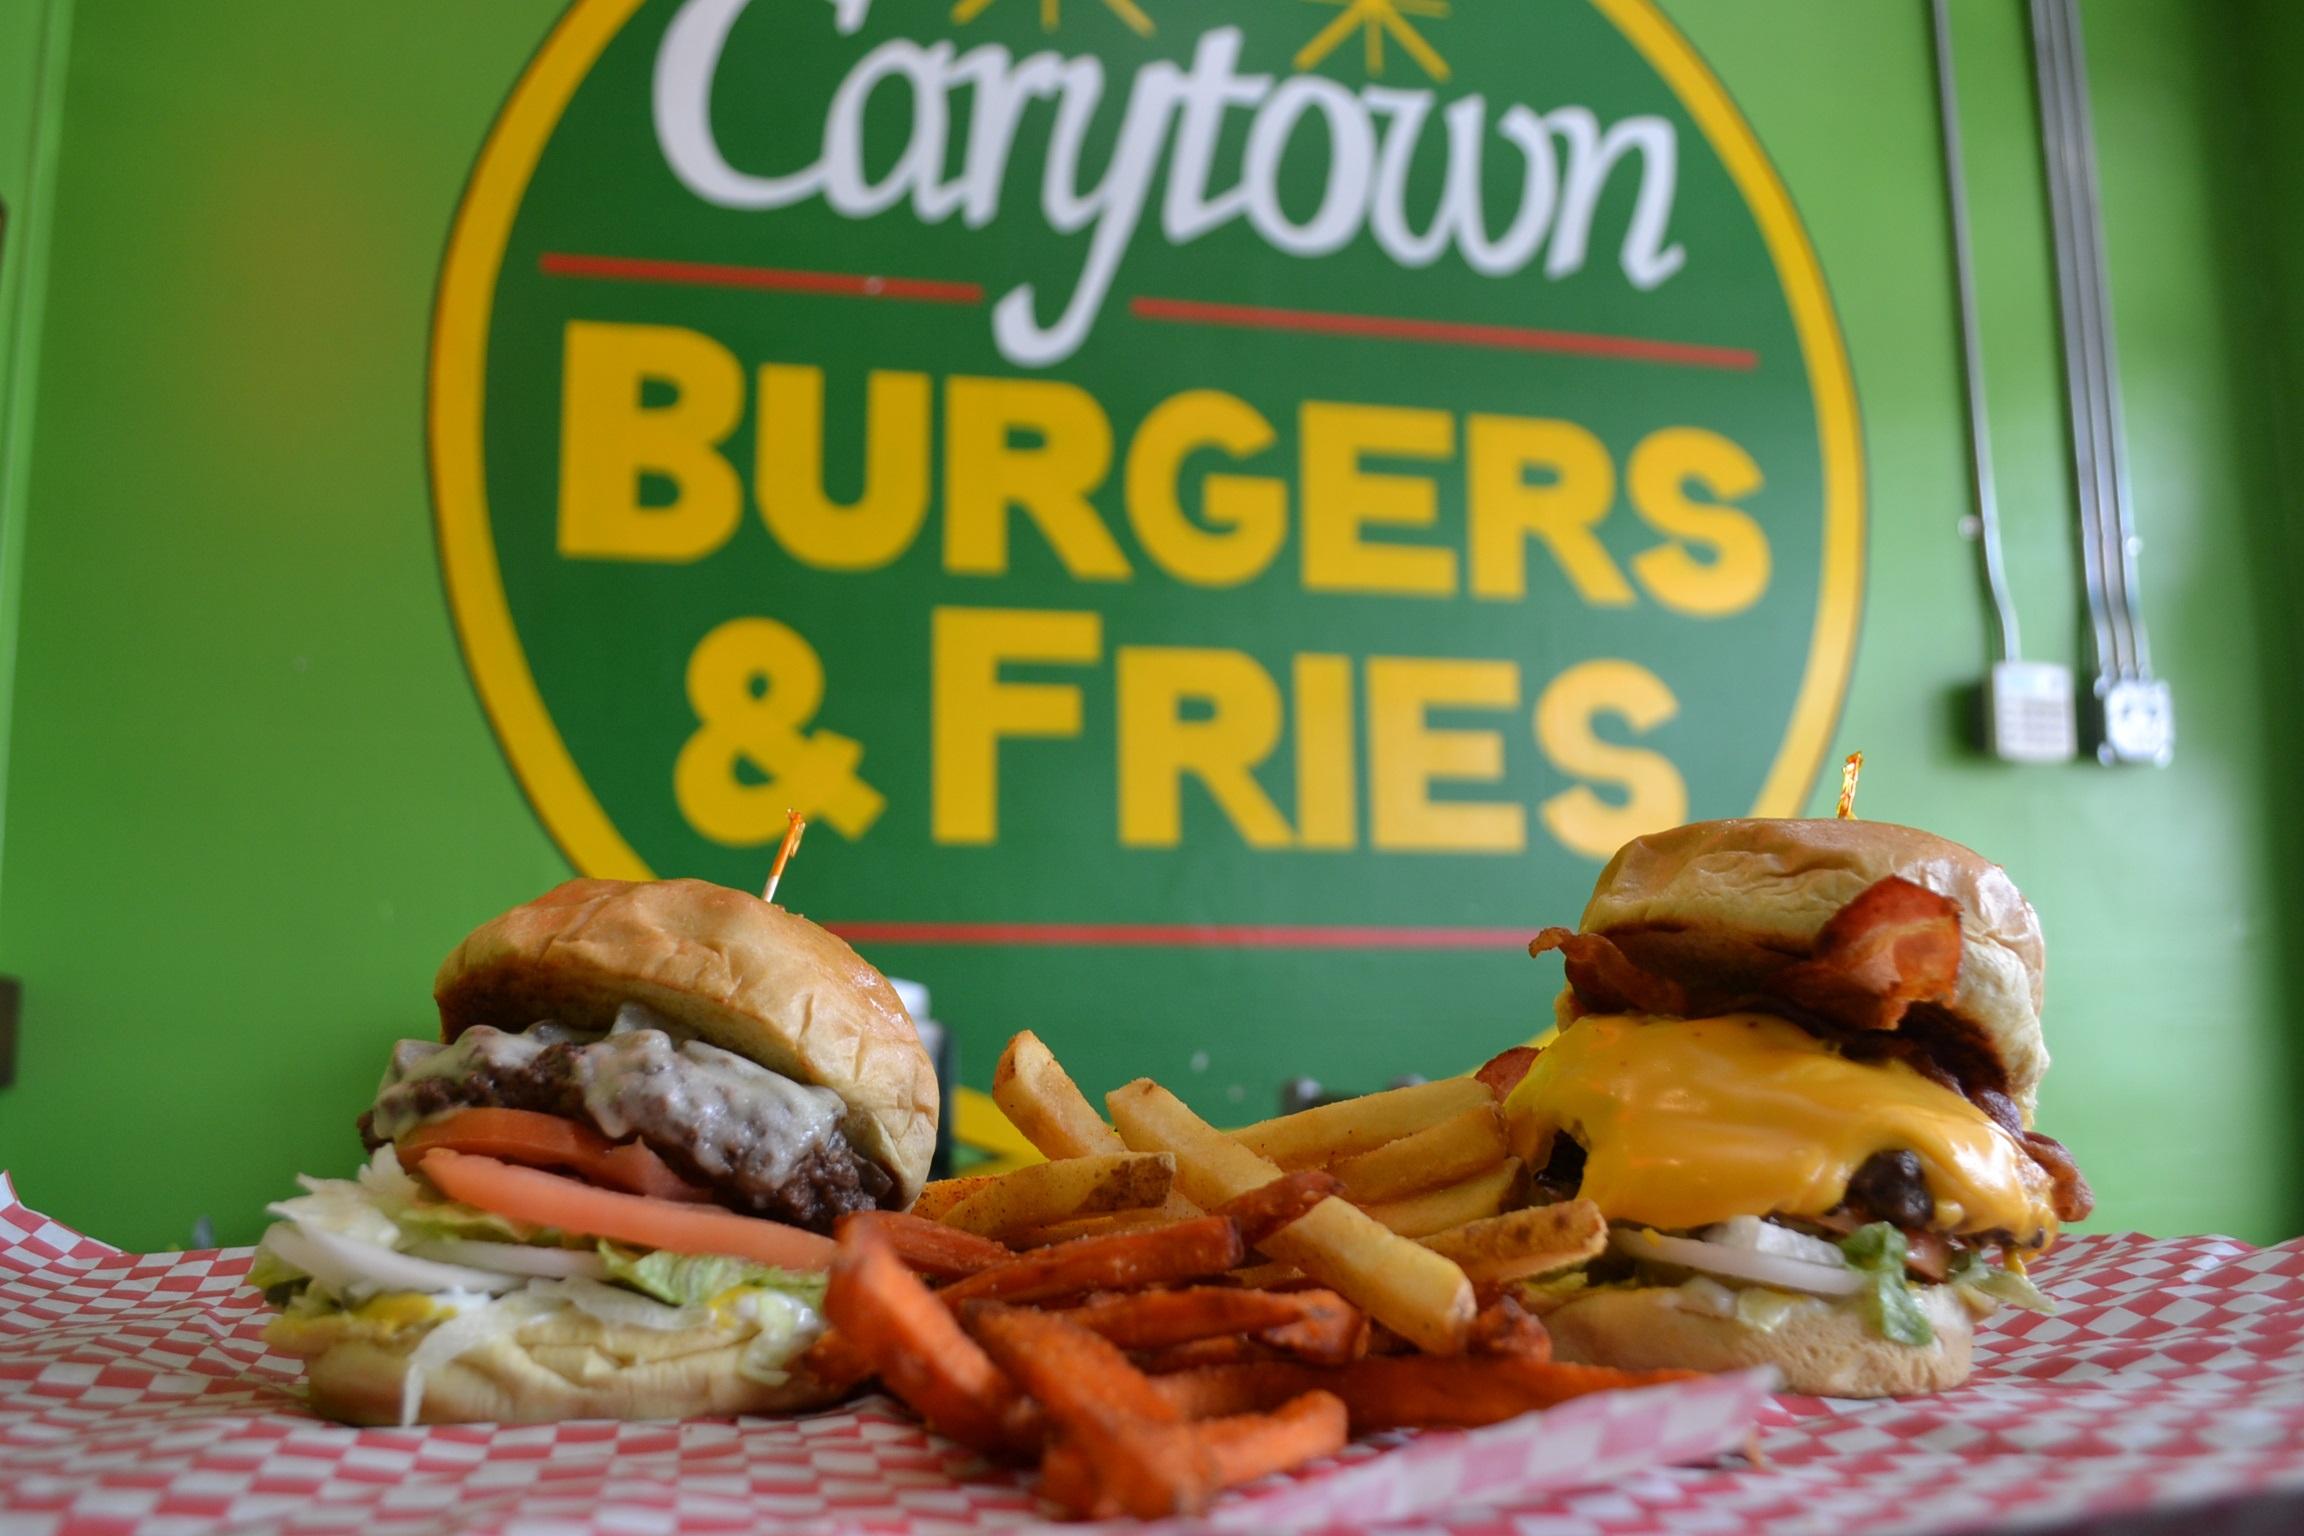 Carytown Burgers & Fries | Burger Restaurants in Richmond, VA